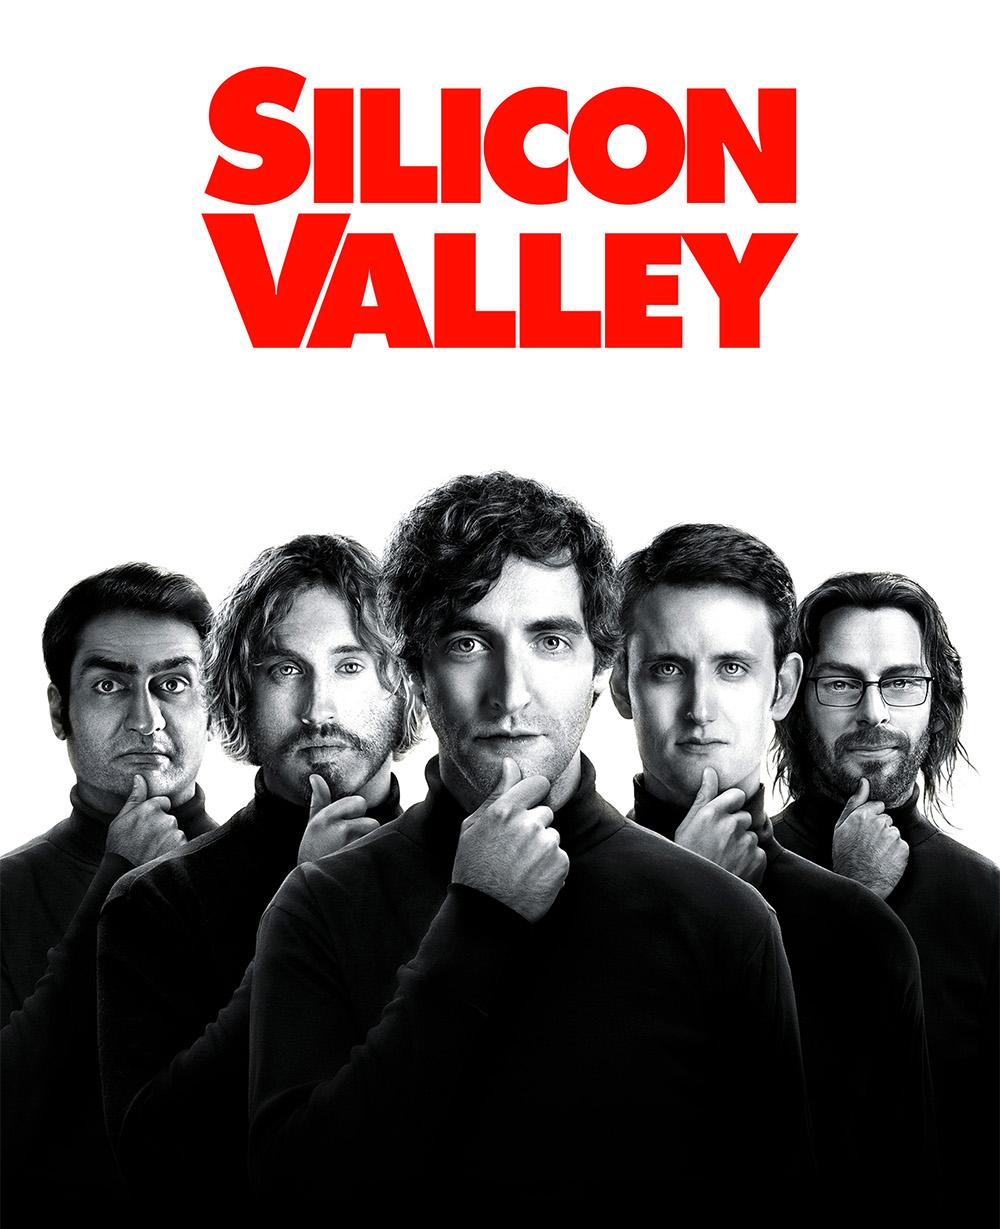 silicon-valley-5509b213926fb.jpg